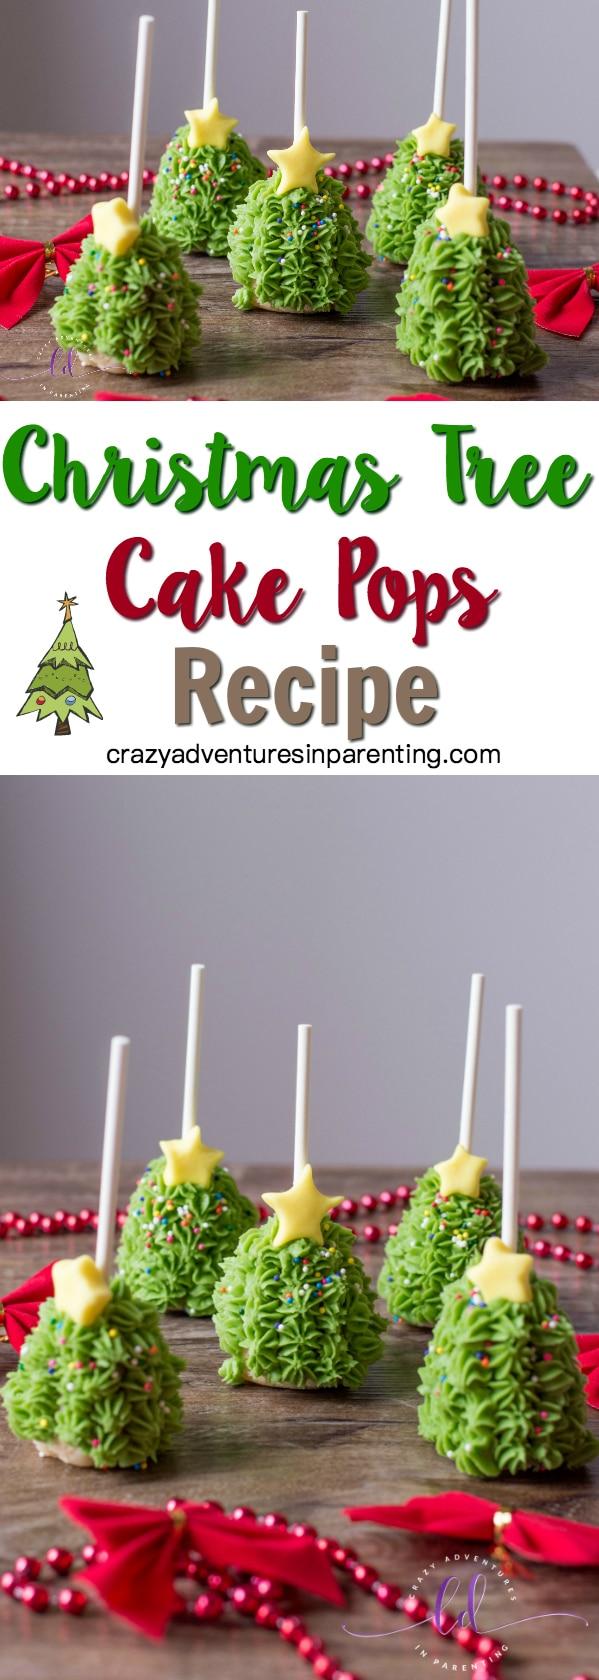 Christmas Tree Cake Pops Recipe